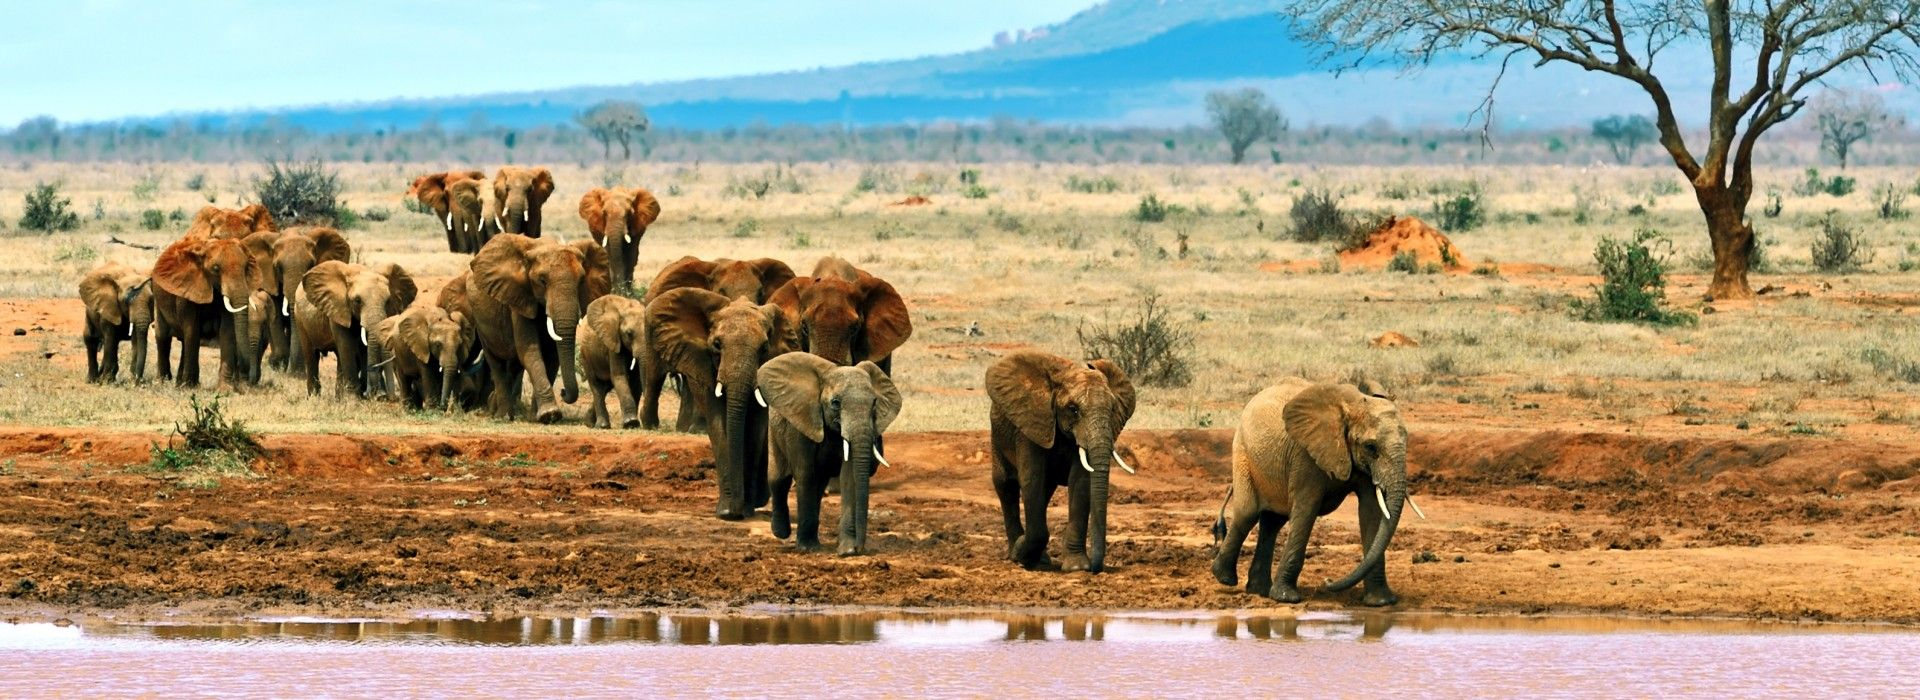 Herds of elephants walking in the Tsavo East National Park